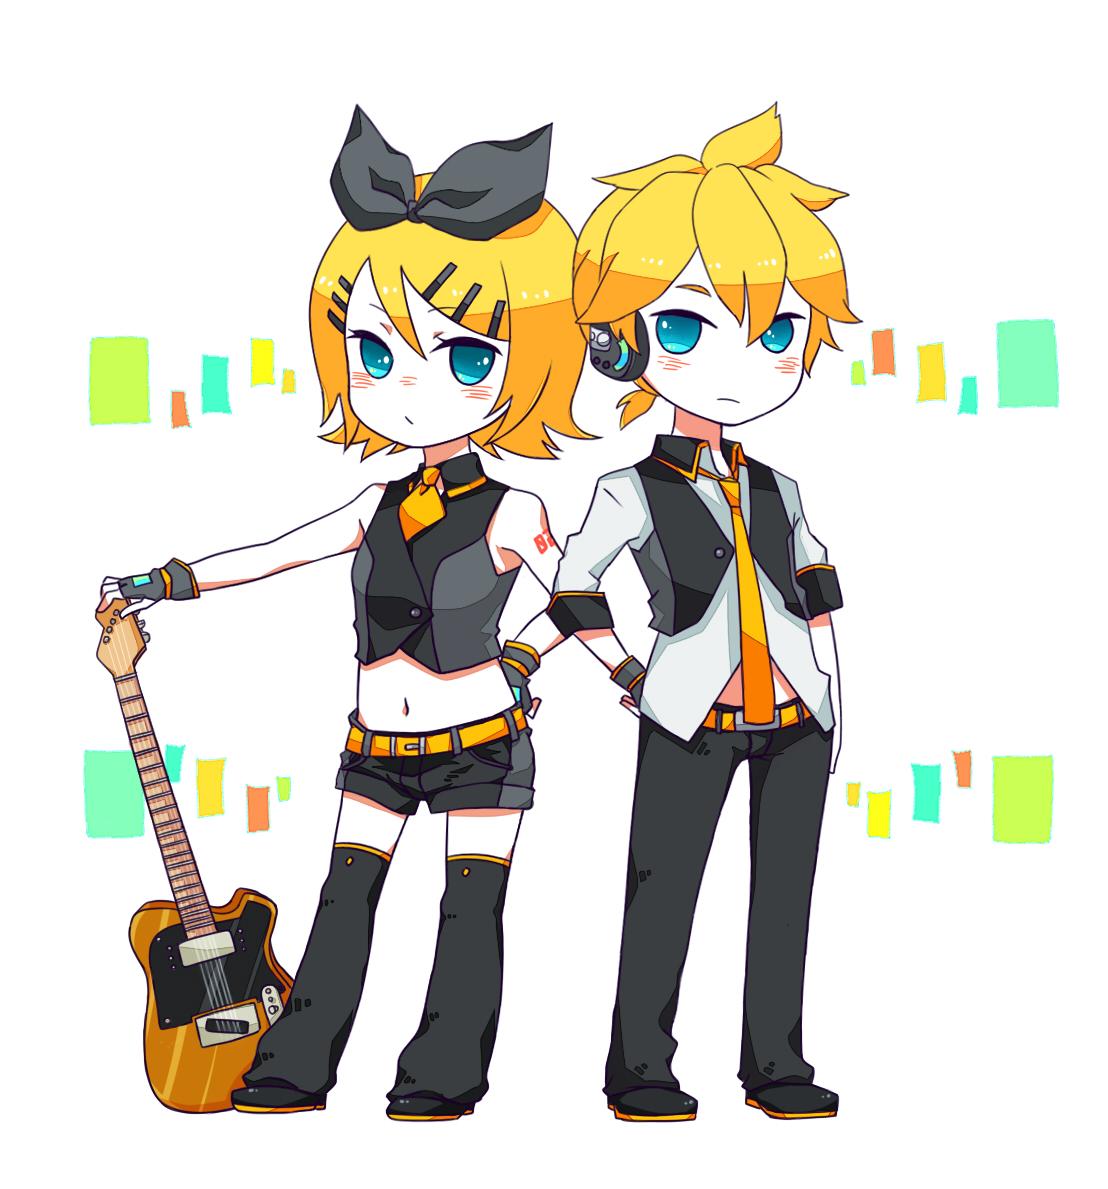 Kagamine mirrors vocaloid image 1295189 zerochan anime image board - Kagamine rin project diva ...